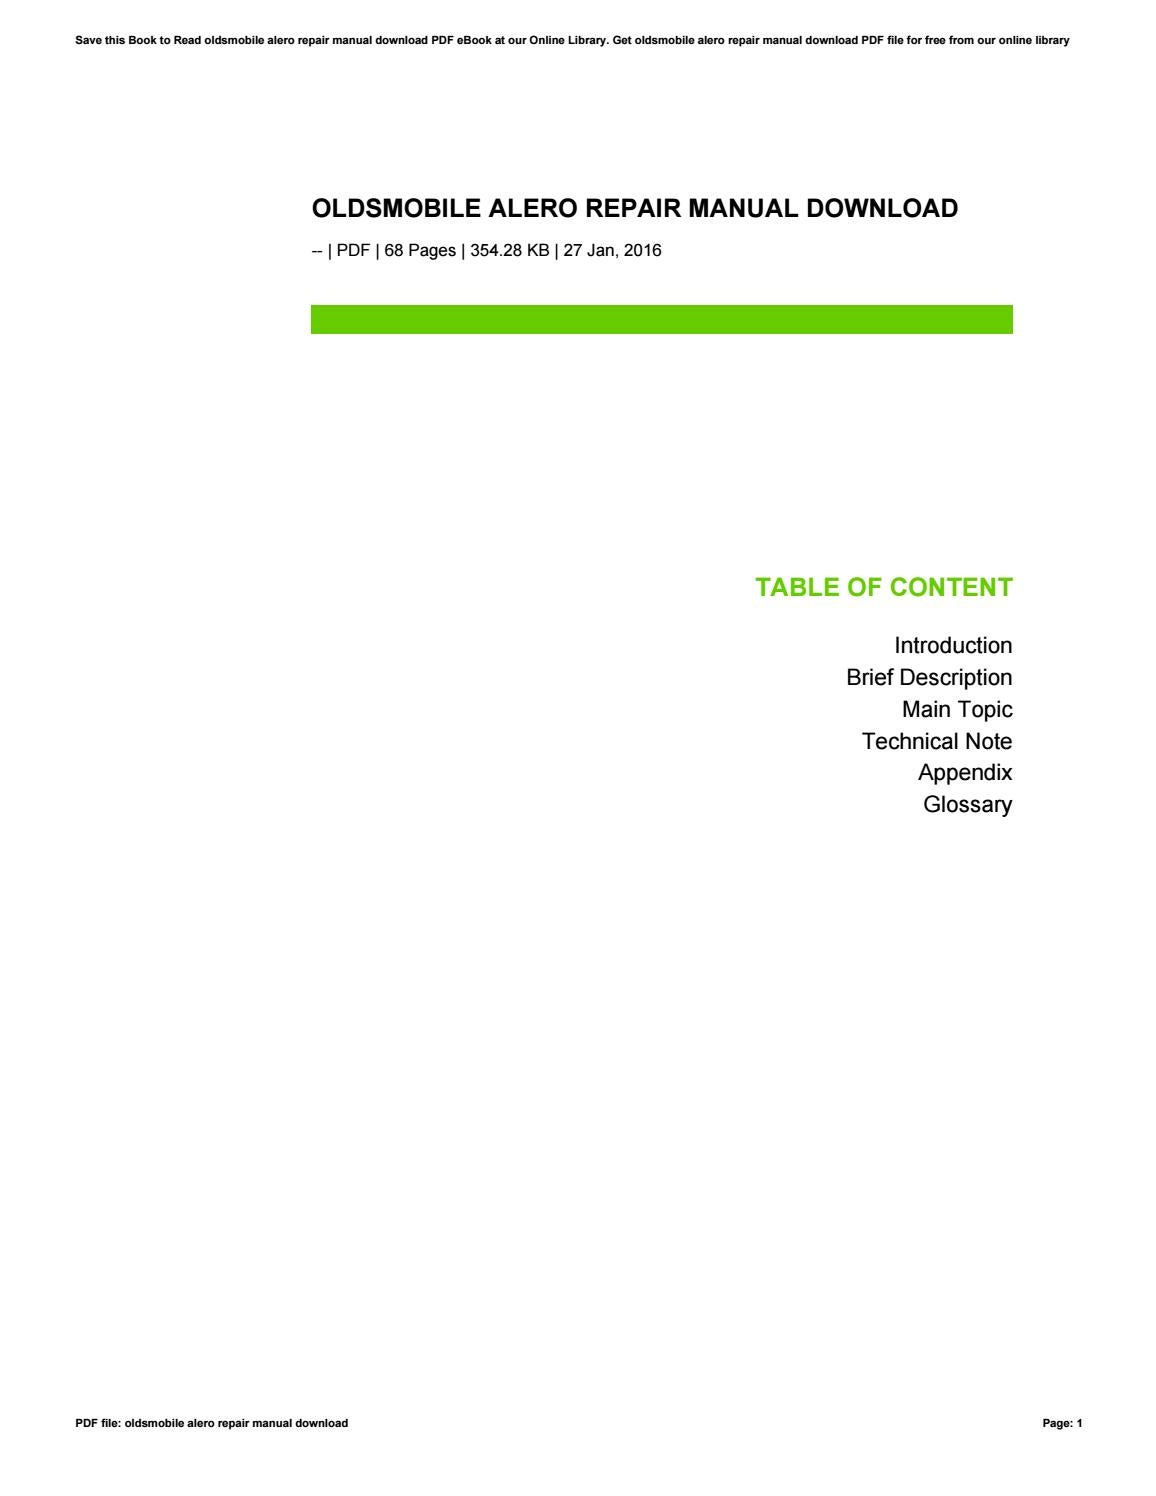 ... Array - 2003 oldsmobile alero engine manual ebook rh 2003 oldsmobile  alero engine manual ebook spi